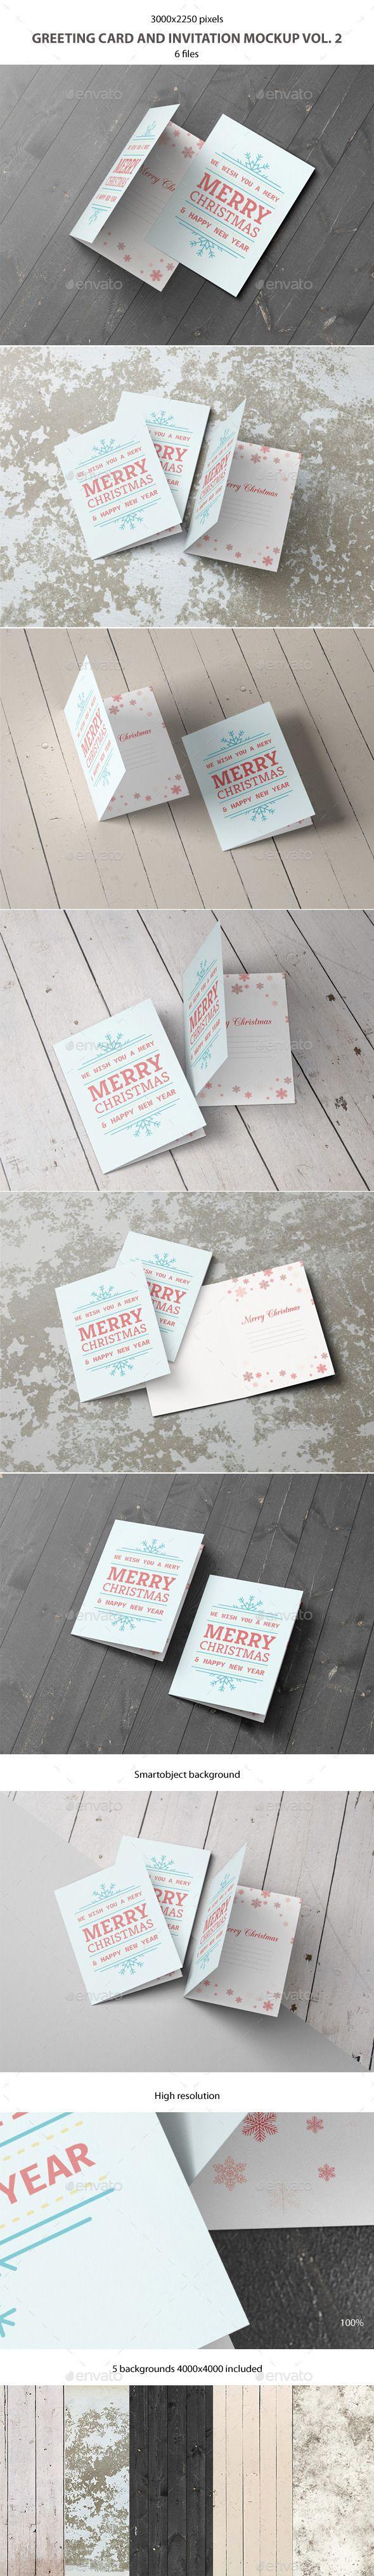 Greeting Card and Invitation Mockup | Download: http://graphicriver.net/item/greeting-card-and-invitation-mockup-vol-2/9273315?ref=ksioks